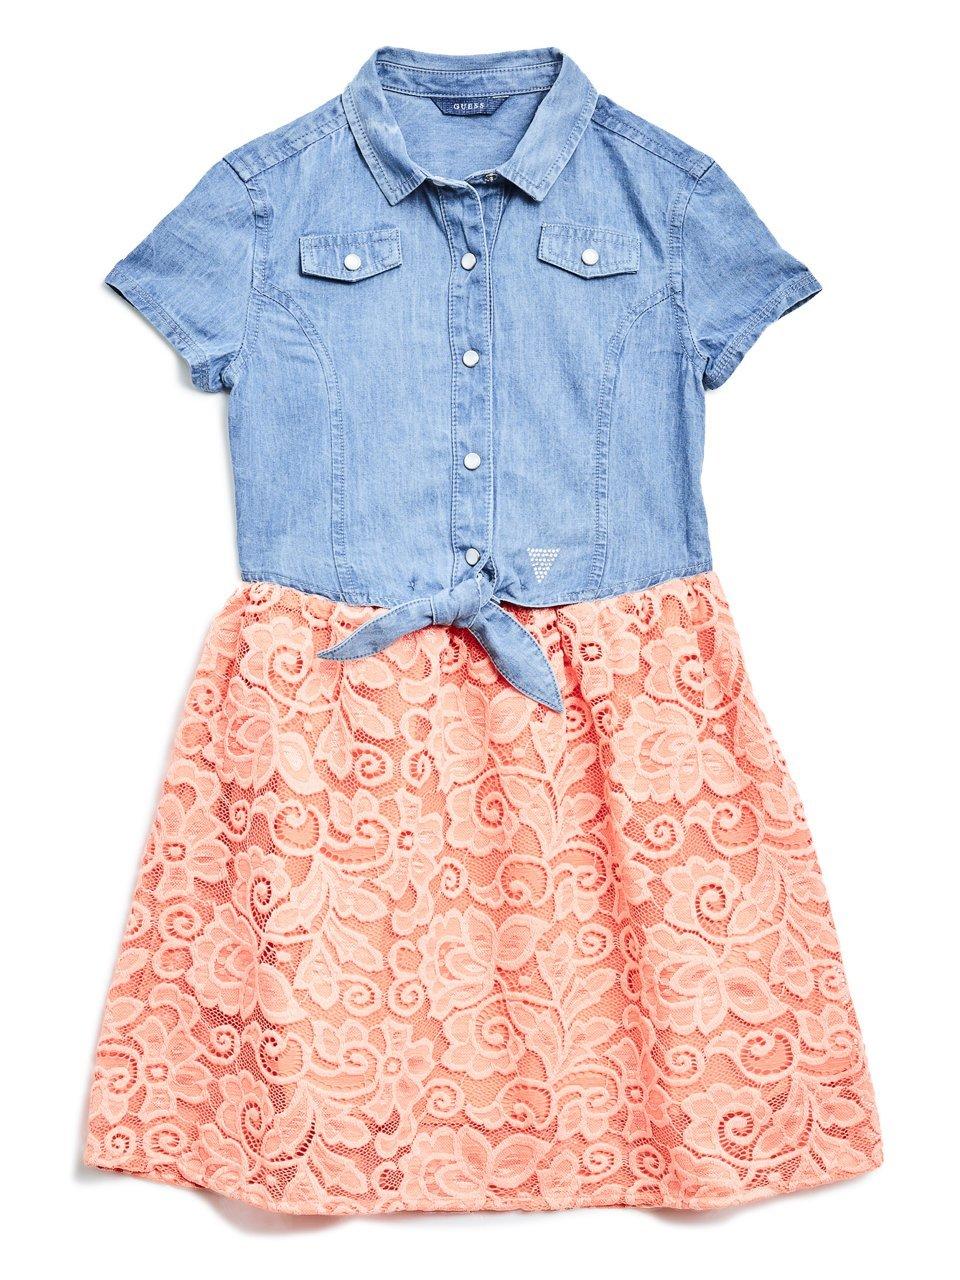 GUESS Denim Two-Fer Dress (7-16)